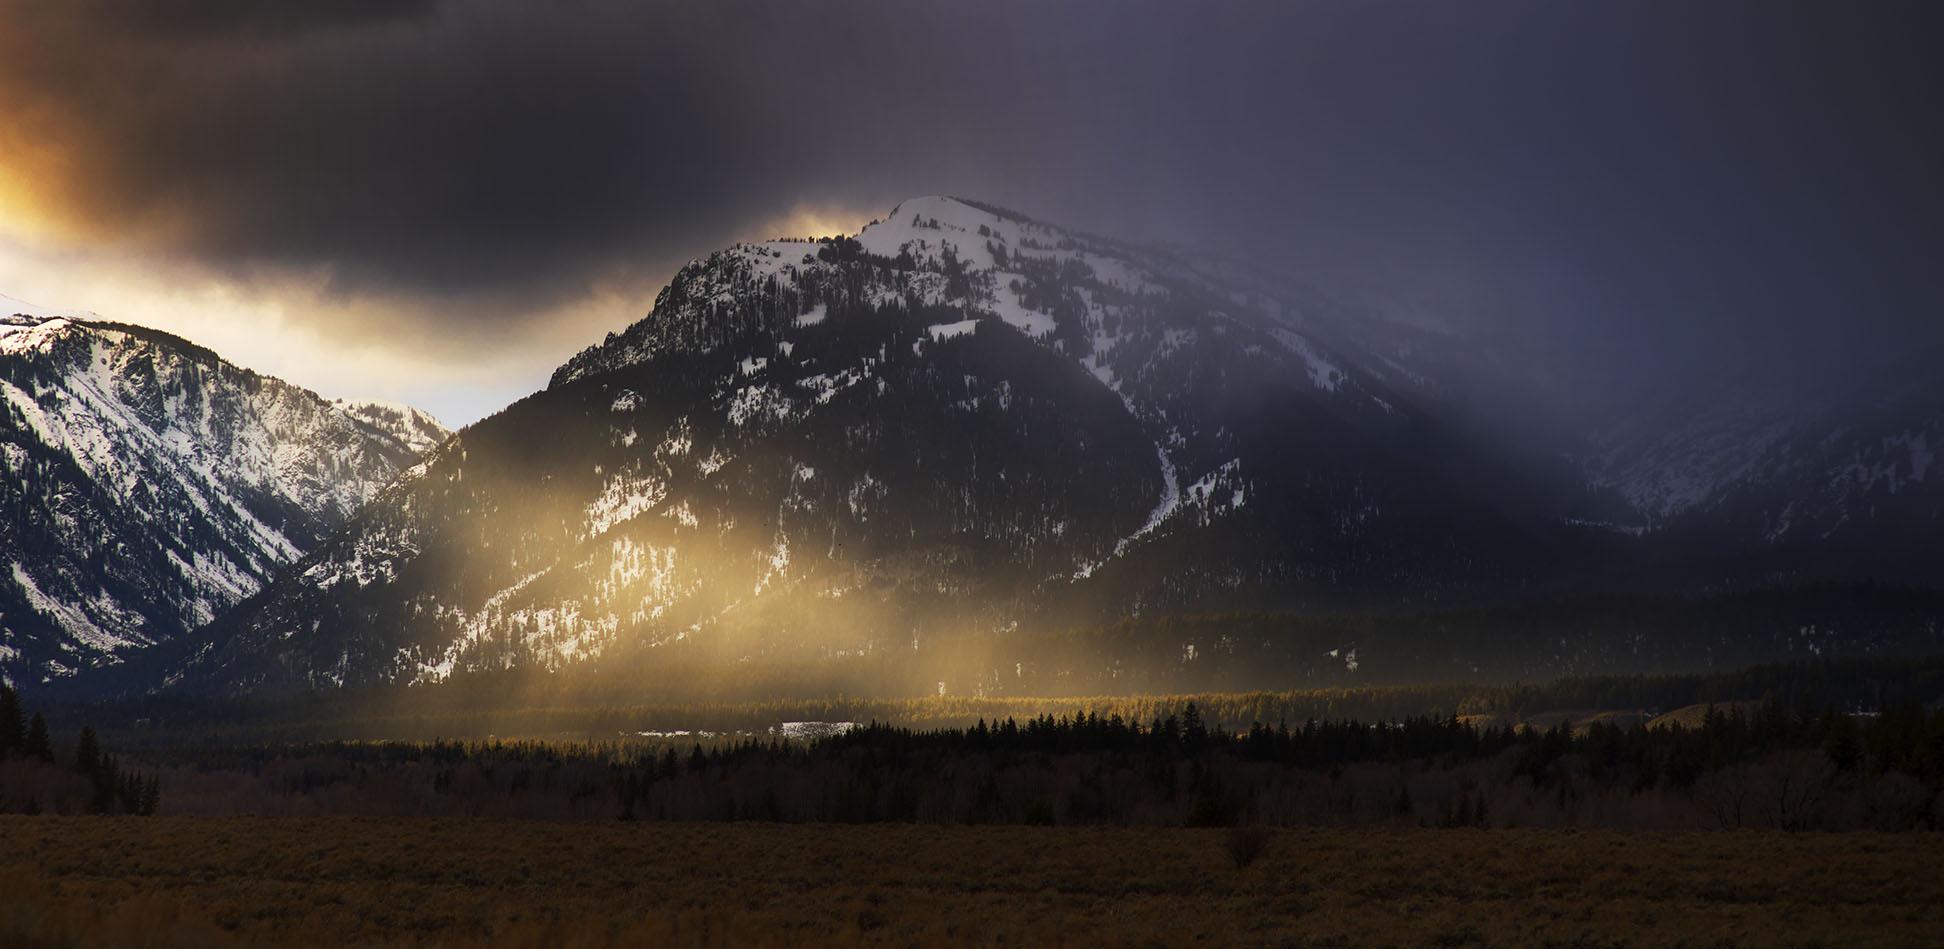 grand teton national park photography guide 3 image